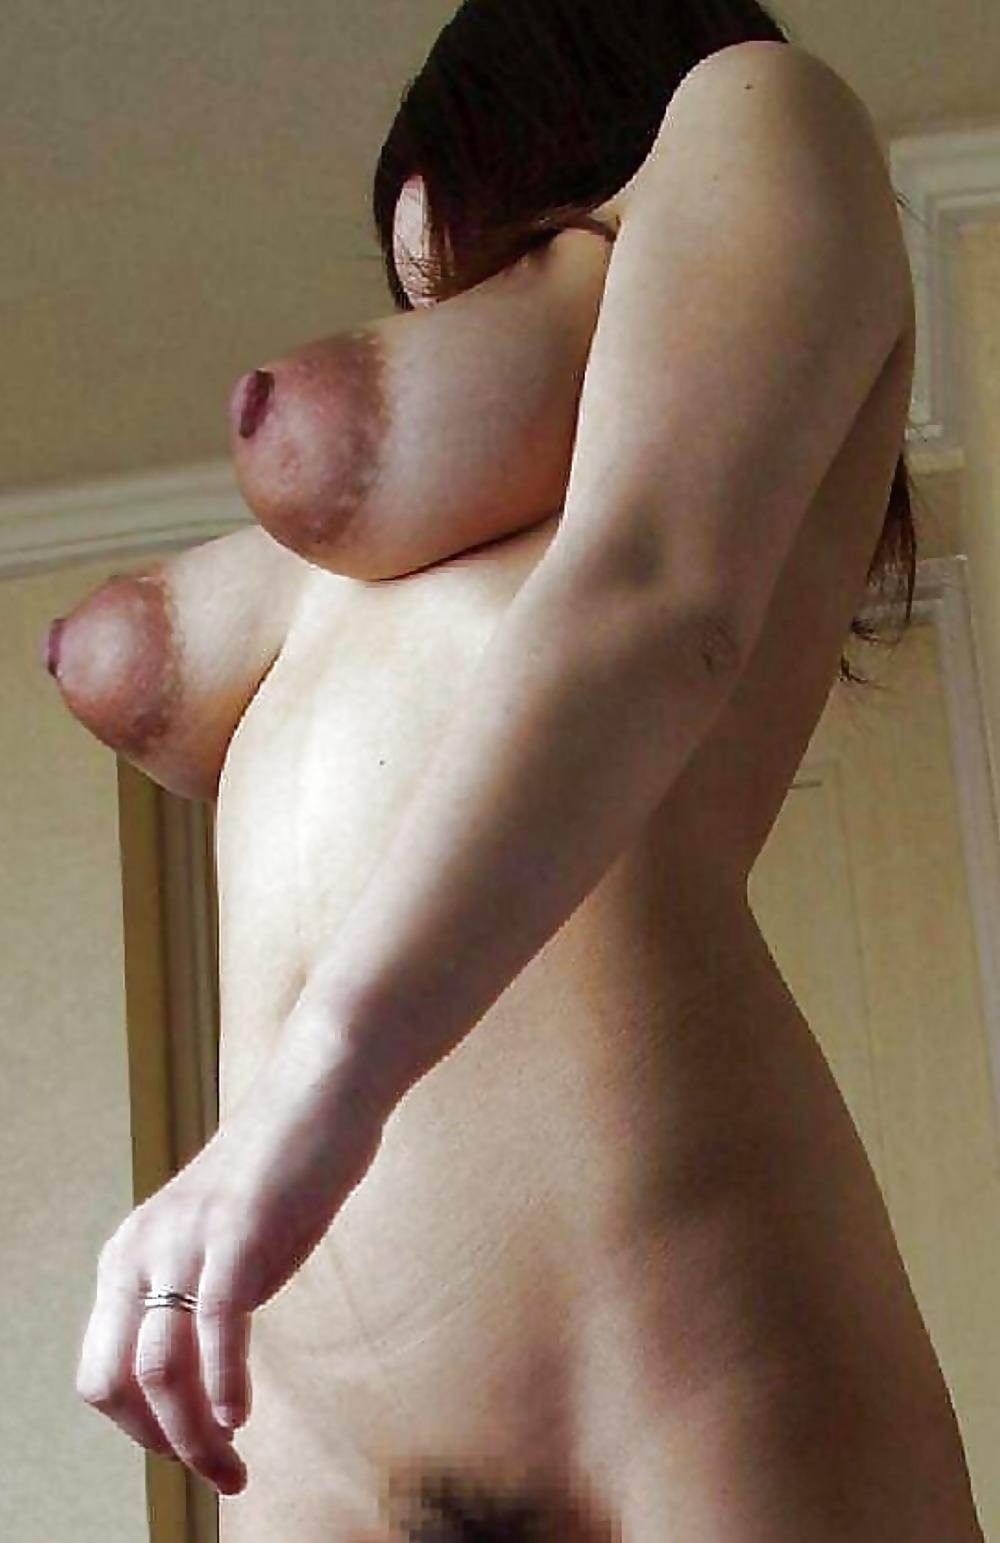 Торчащие Соски Порно Фото